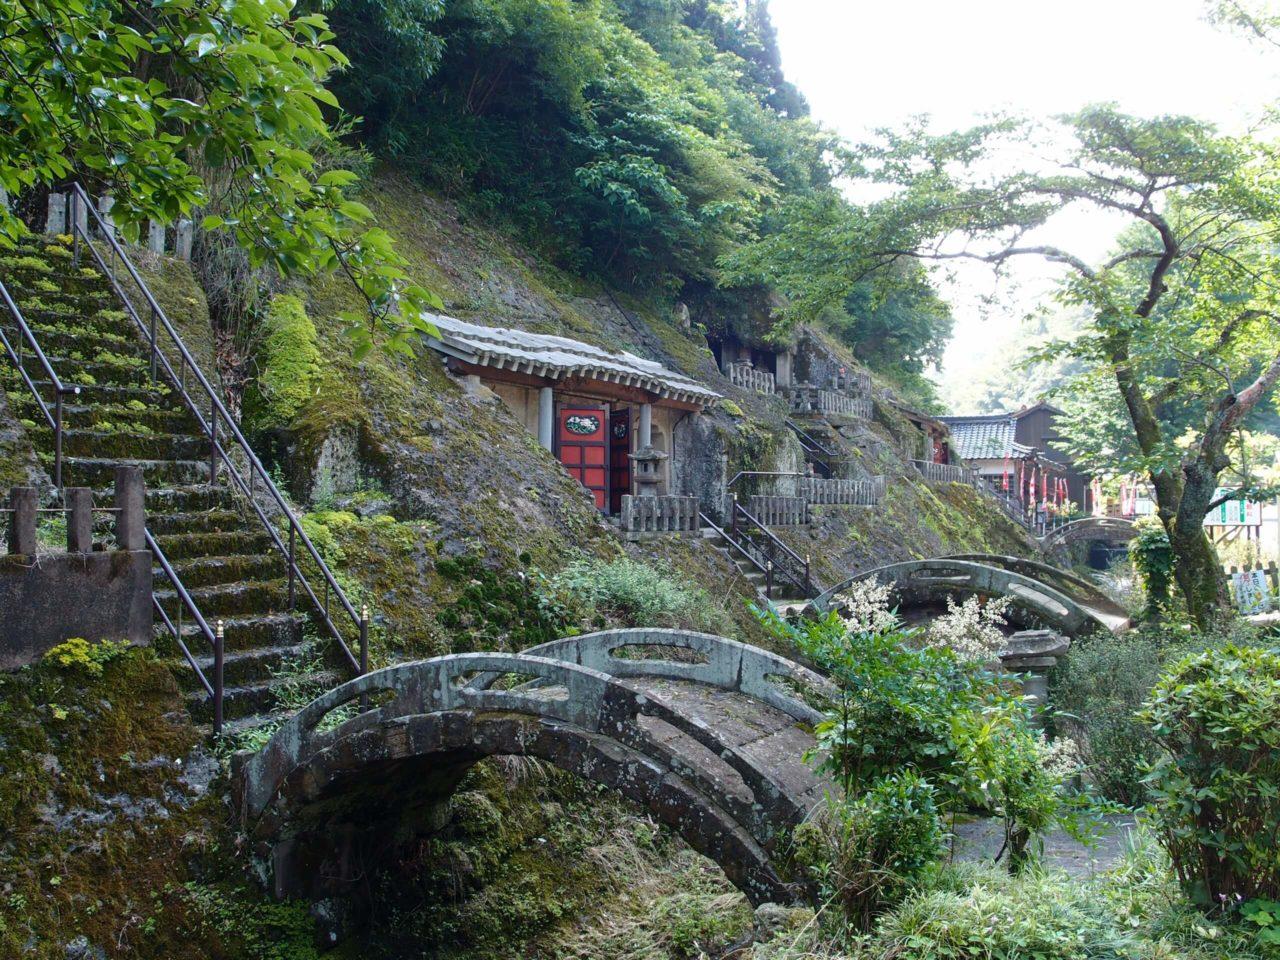 P6256345 scaled - 【島根 石見銀山】日本を支えた産業の文化的景観。石見銀山にいこう!